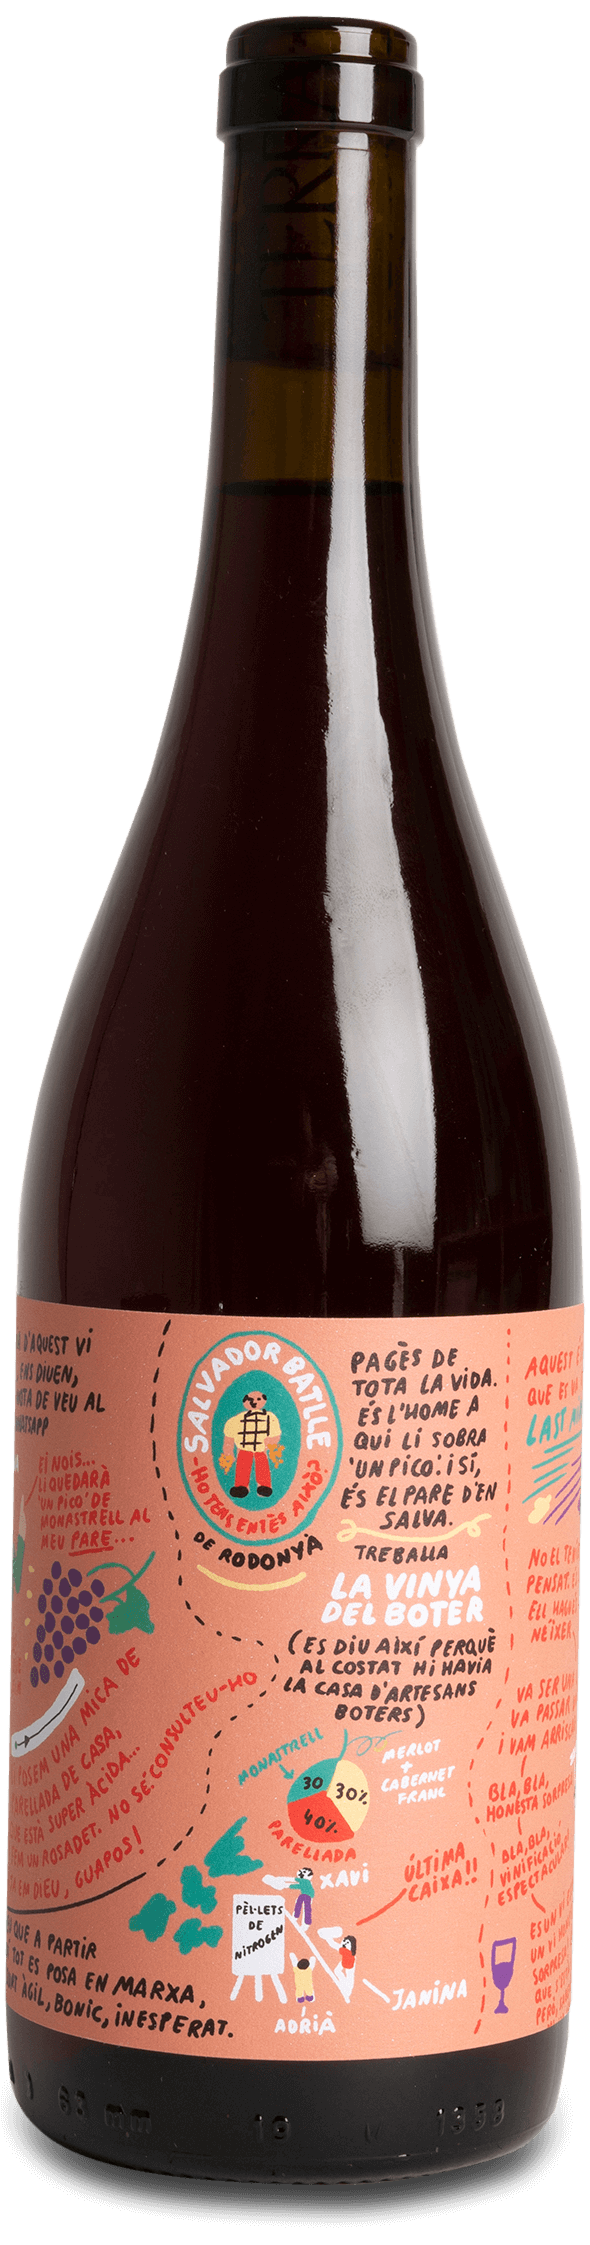 La Vinya del Boter - Vinsupernaturel